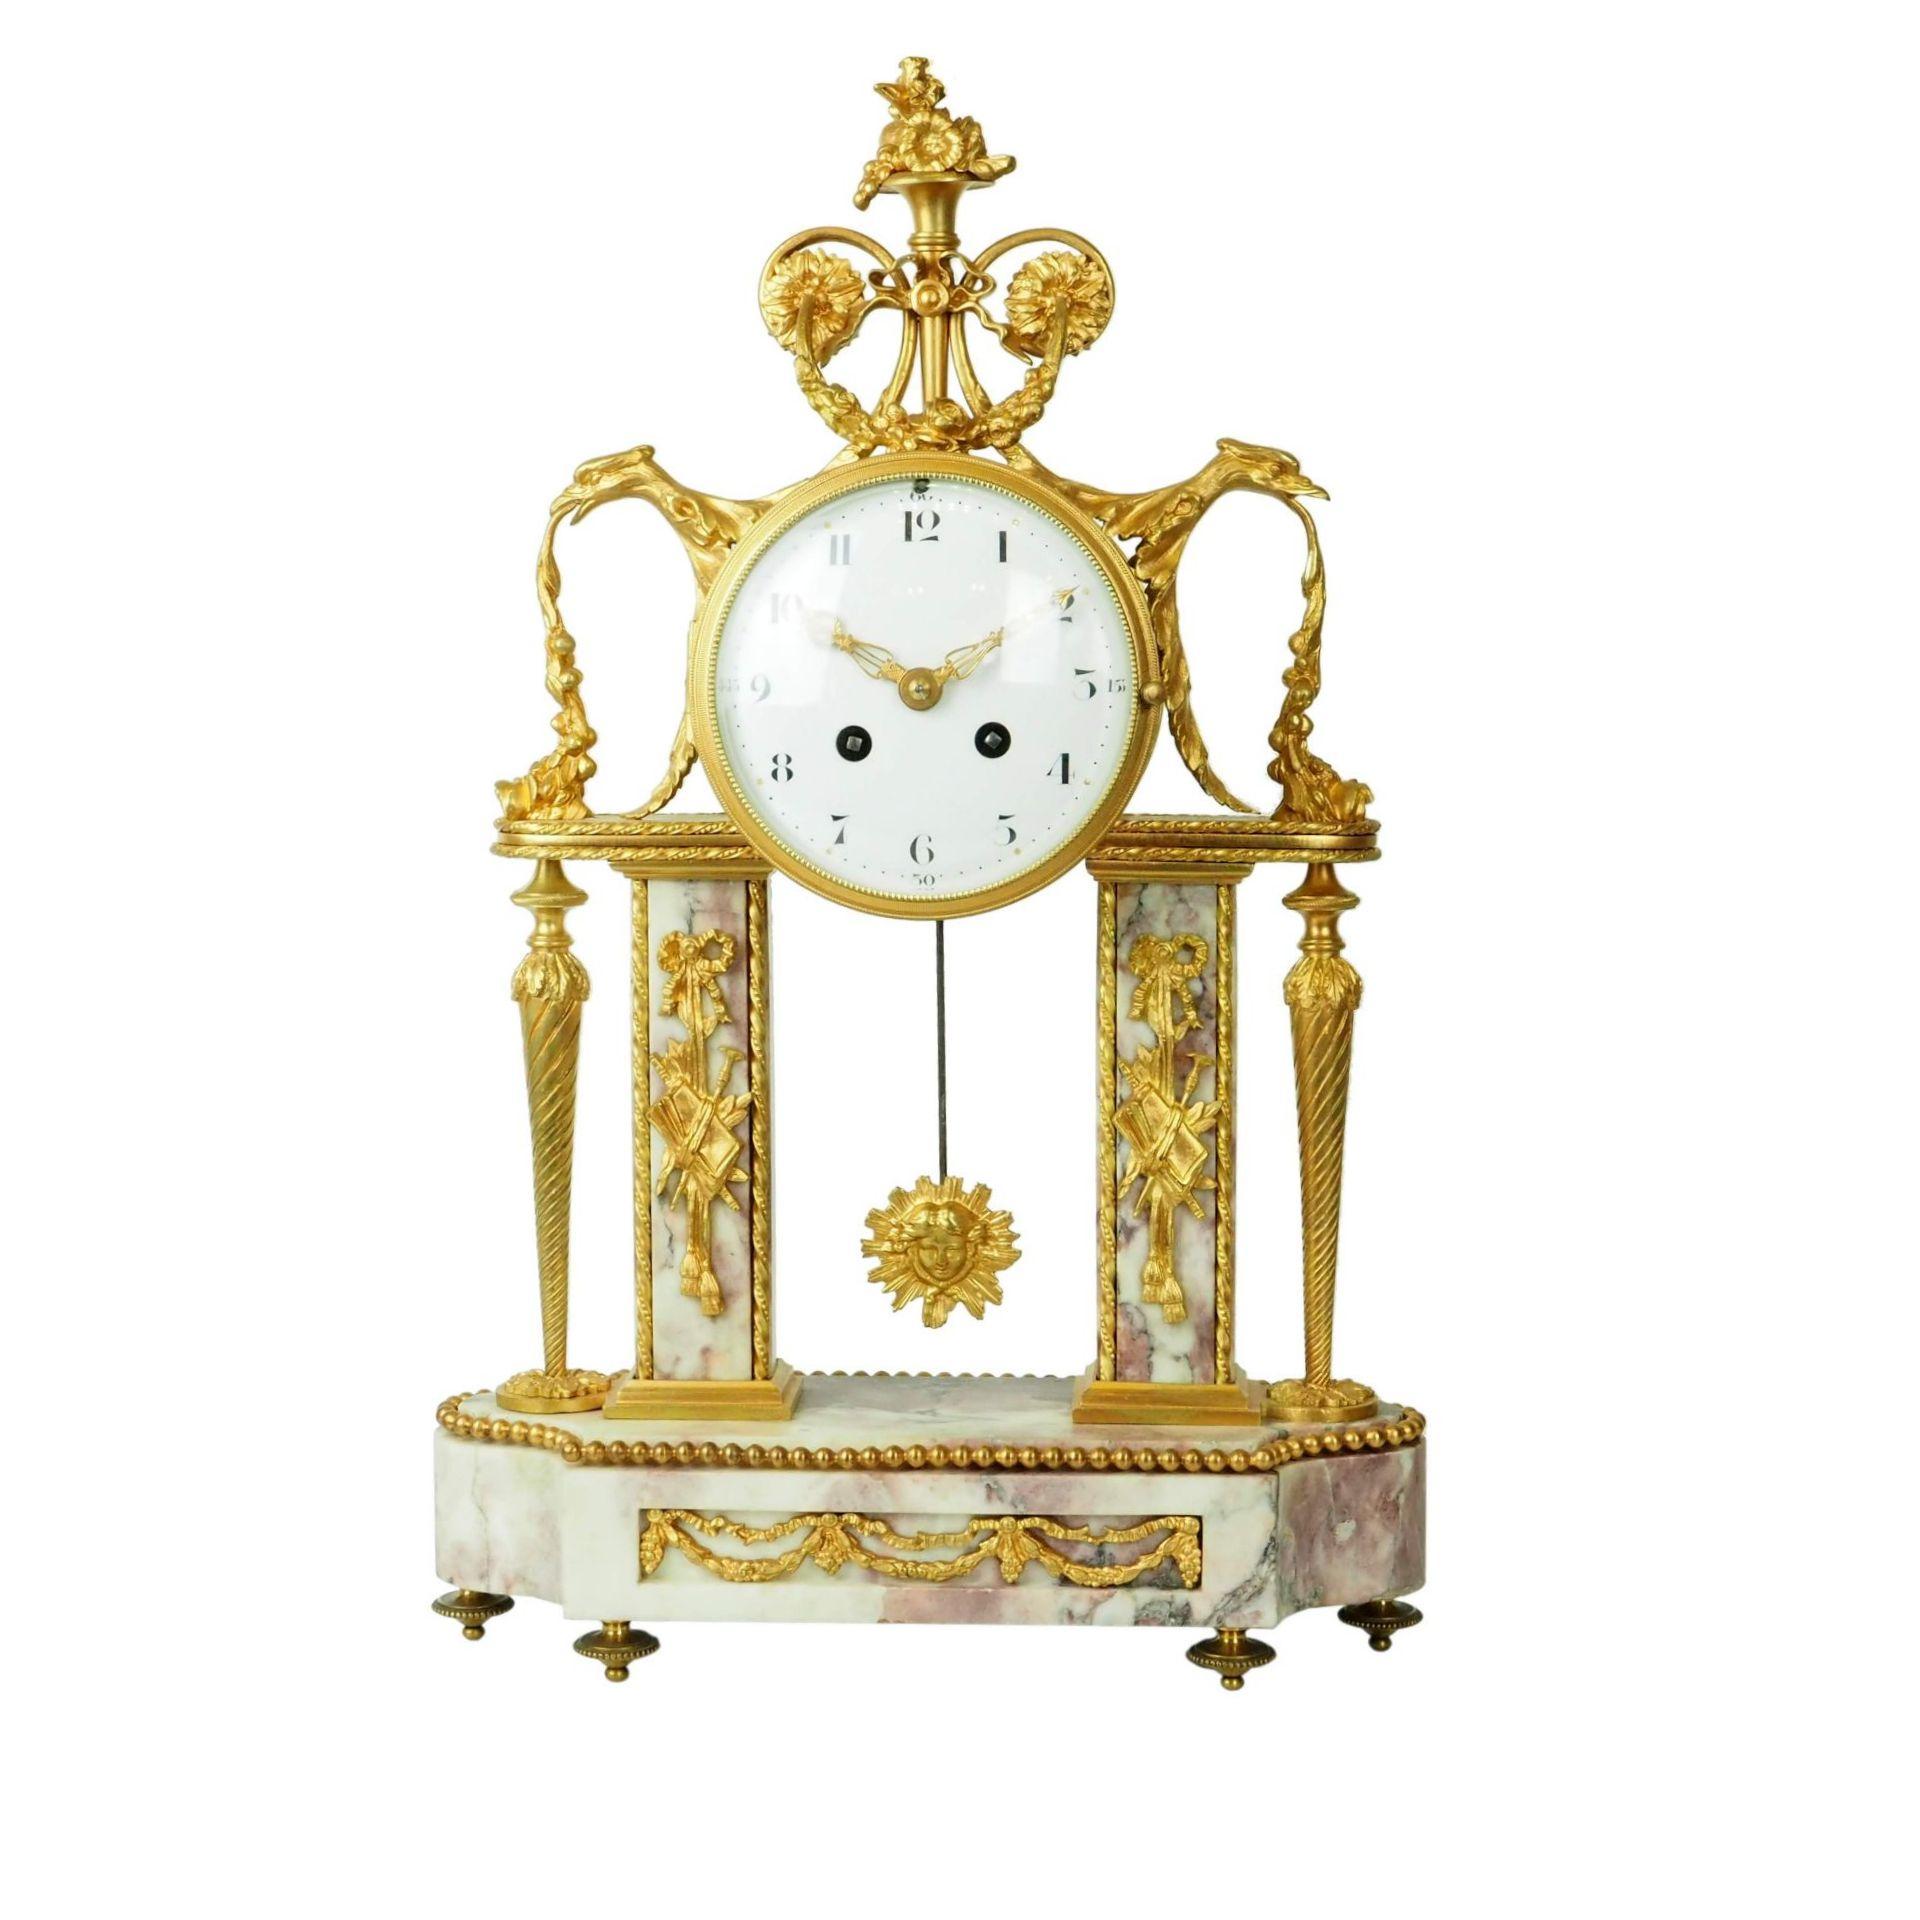 zegar francuski z 1855 roku